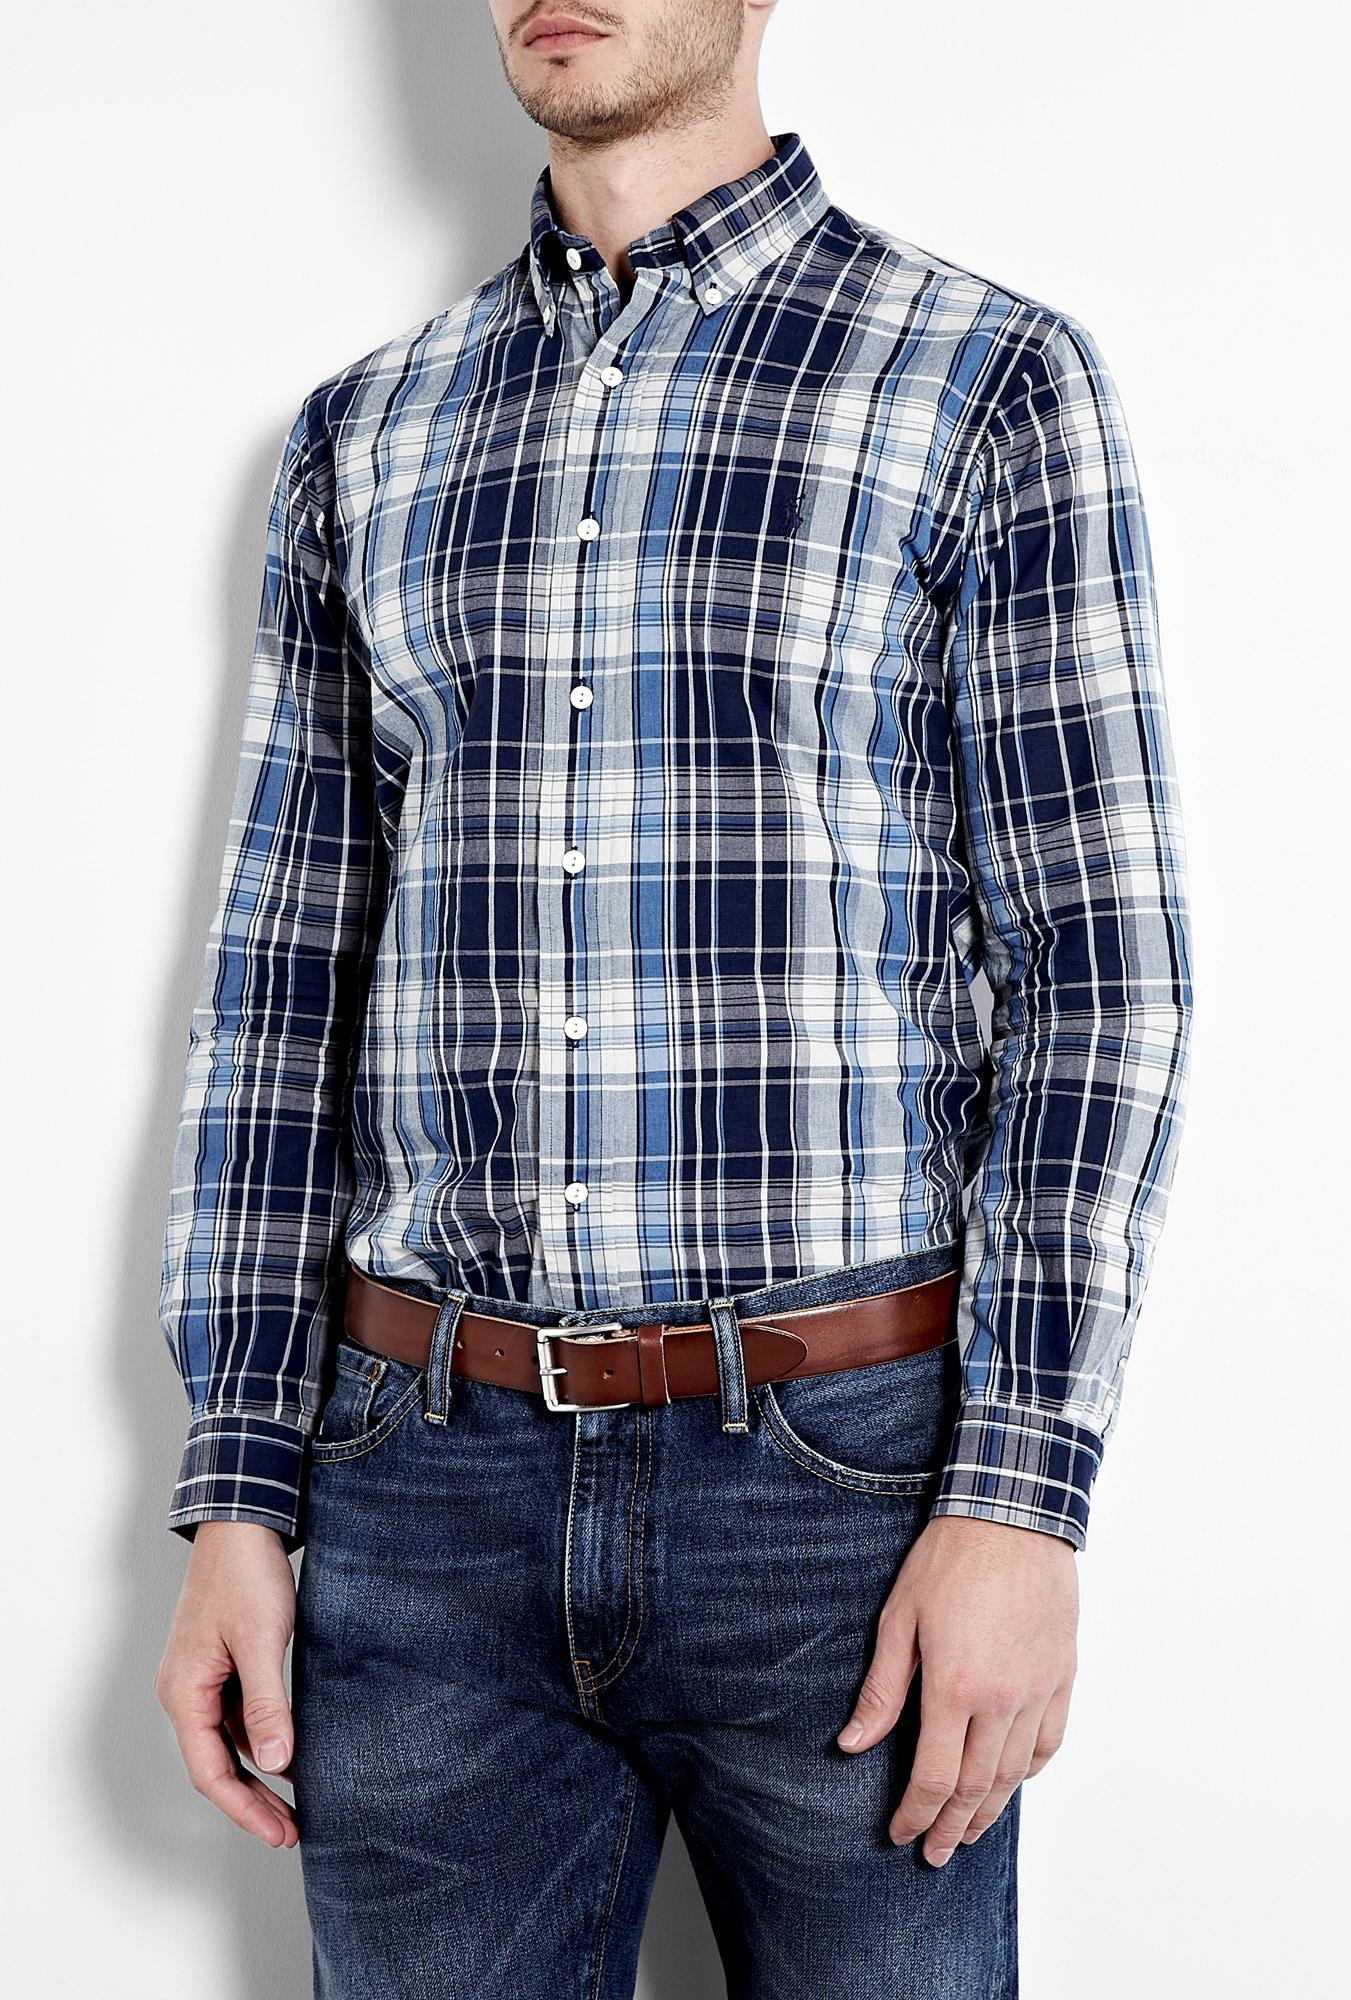 Polo Ralph Lauren Navy Blue Plaid Madras Cotton Shirt In